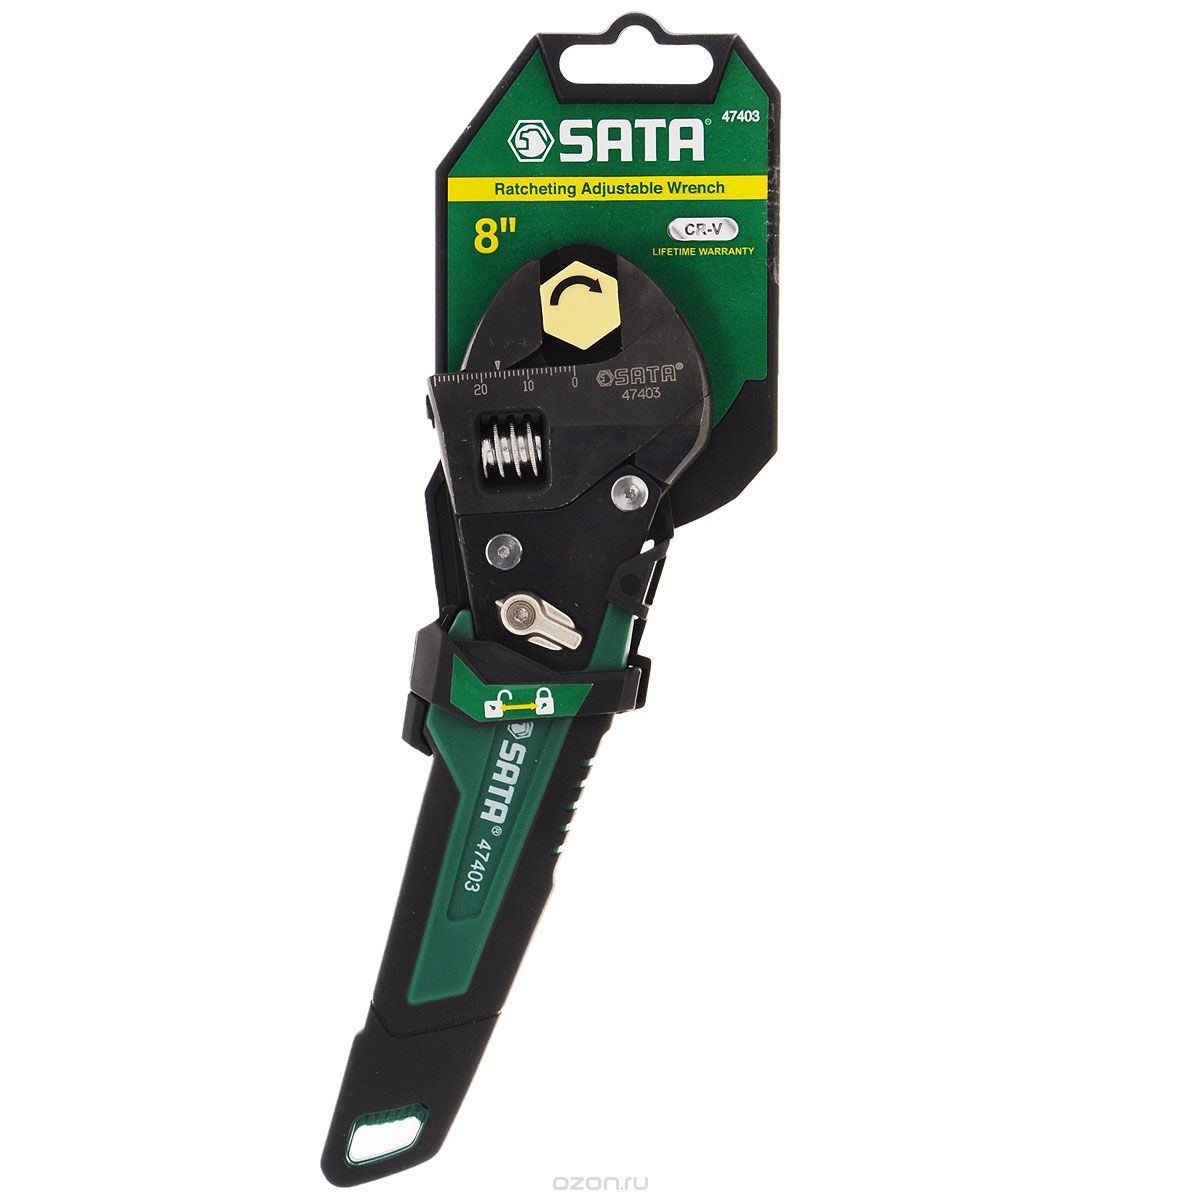 Разводной ключ SATA 47403